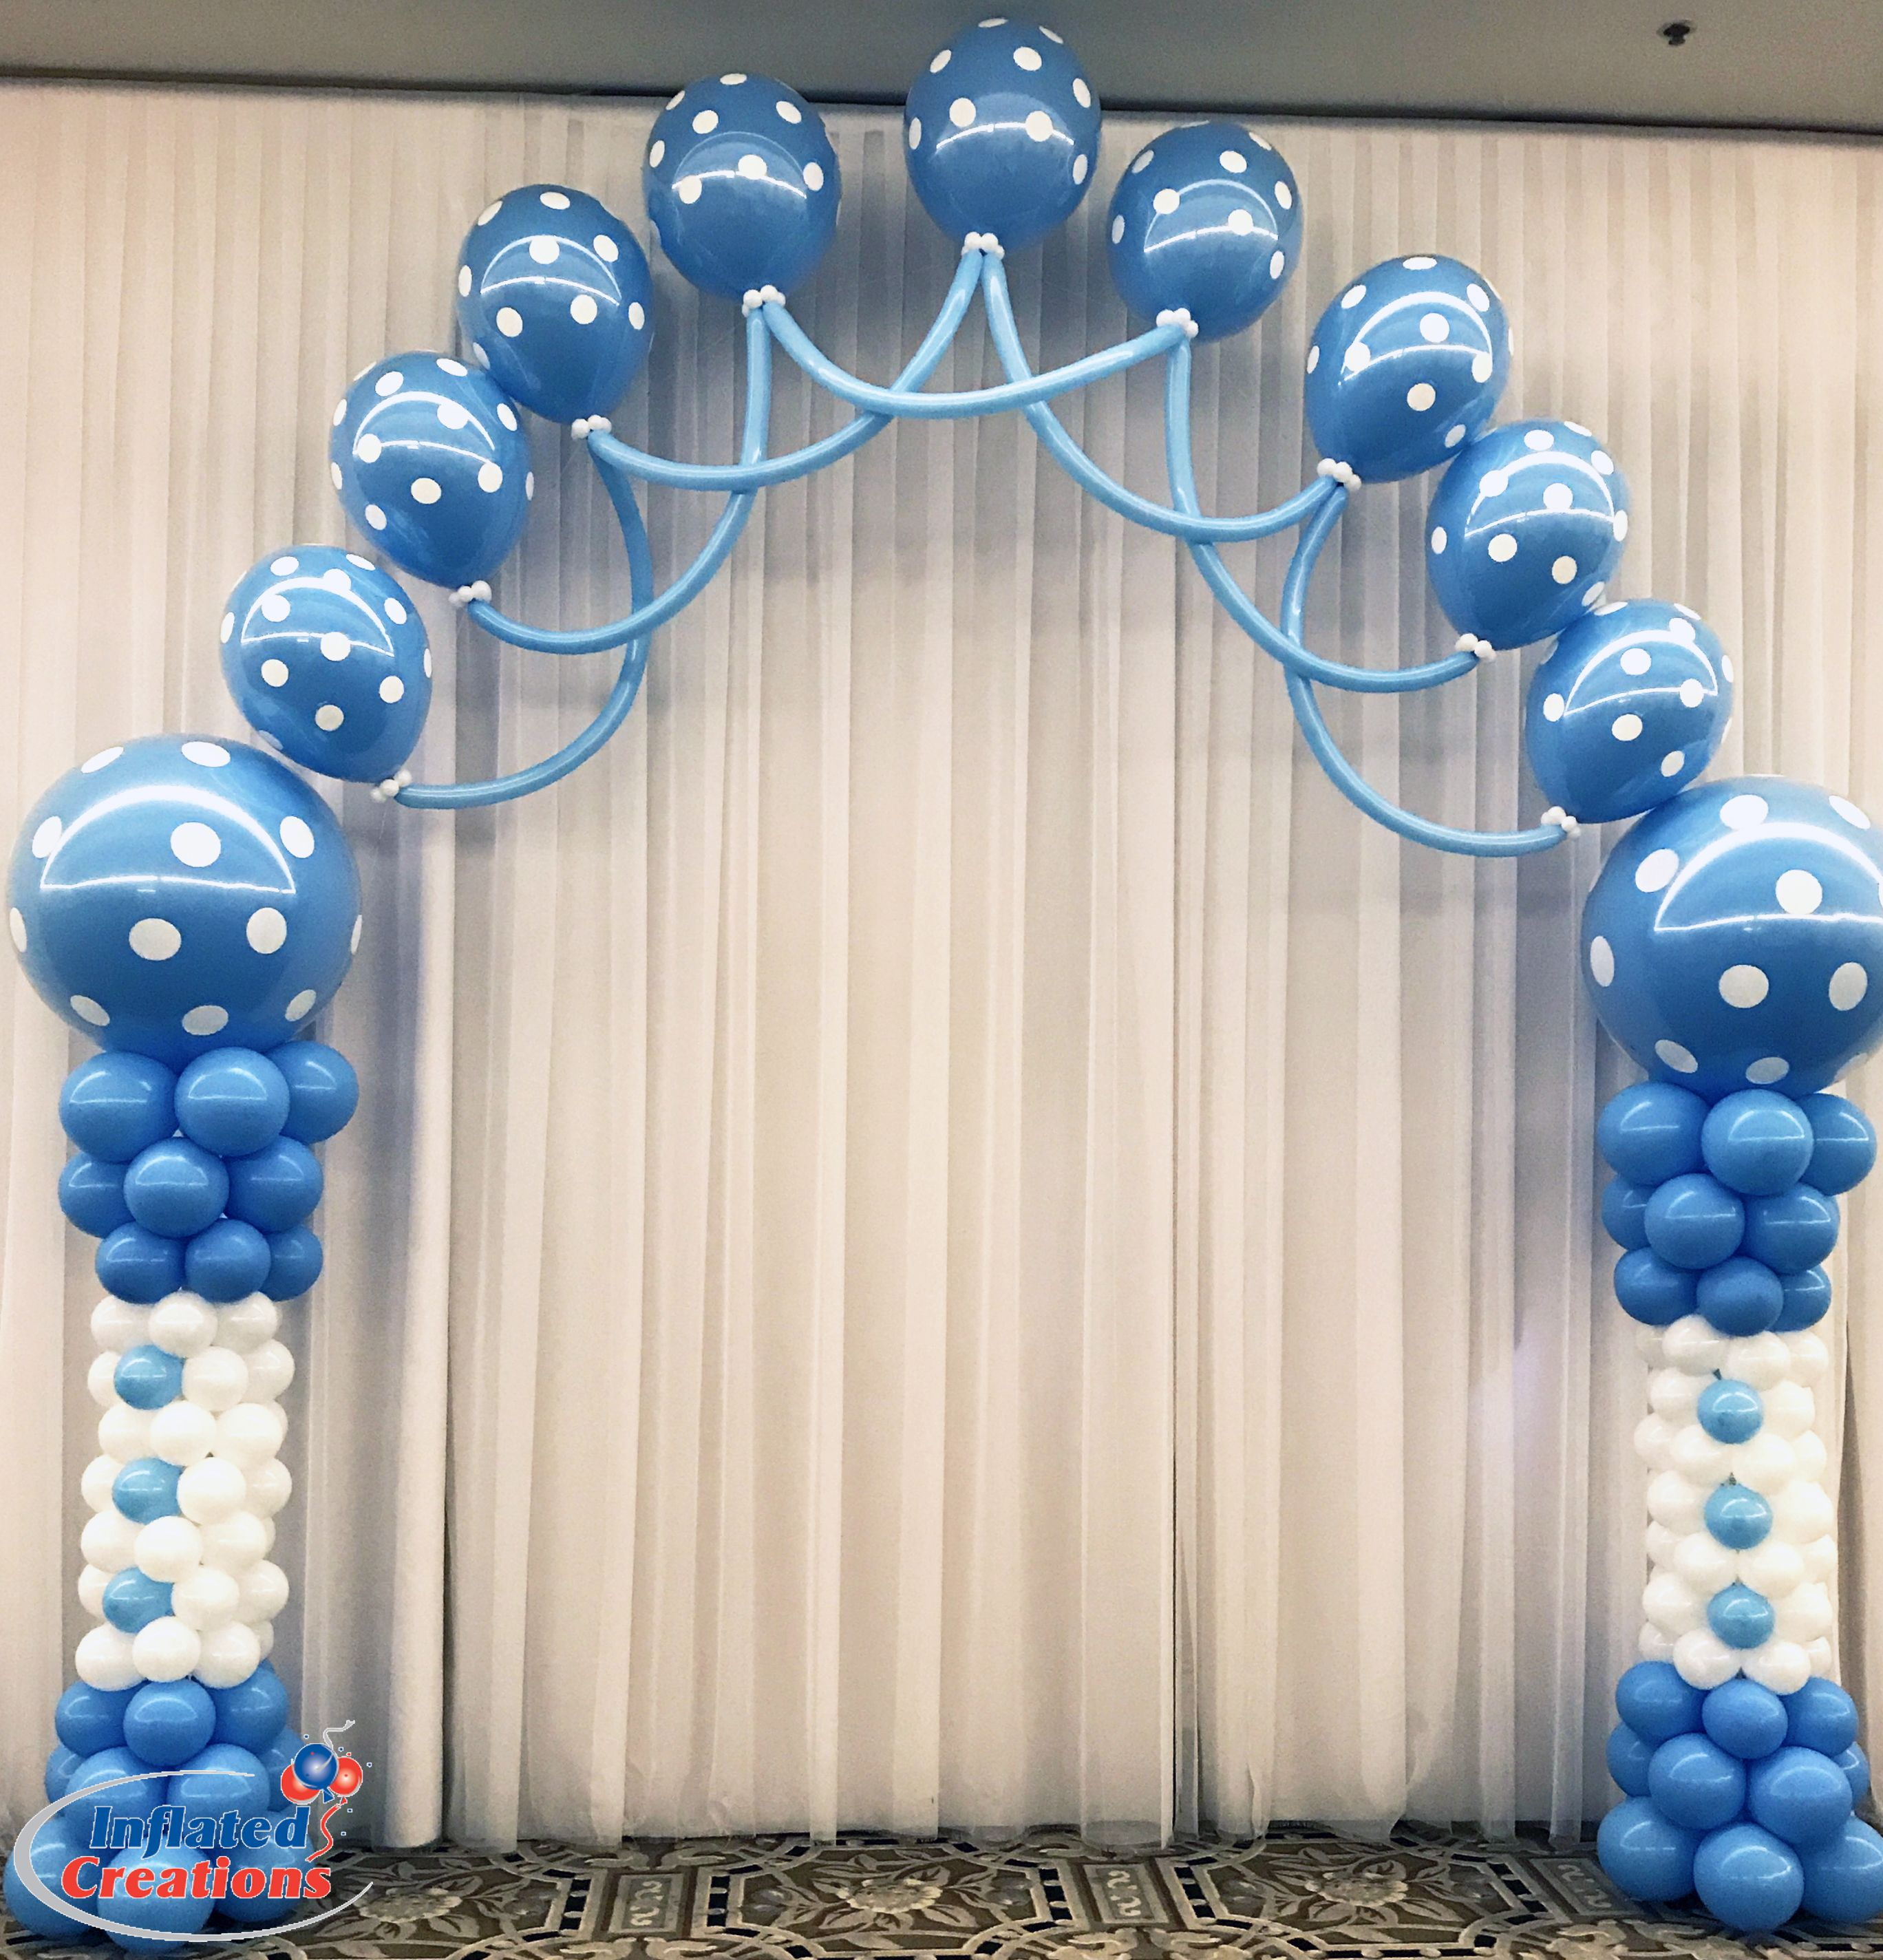 Balloon arch baby boy | Baby shower balloons | Pinterest | Arch ...